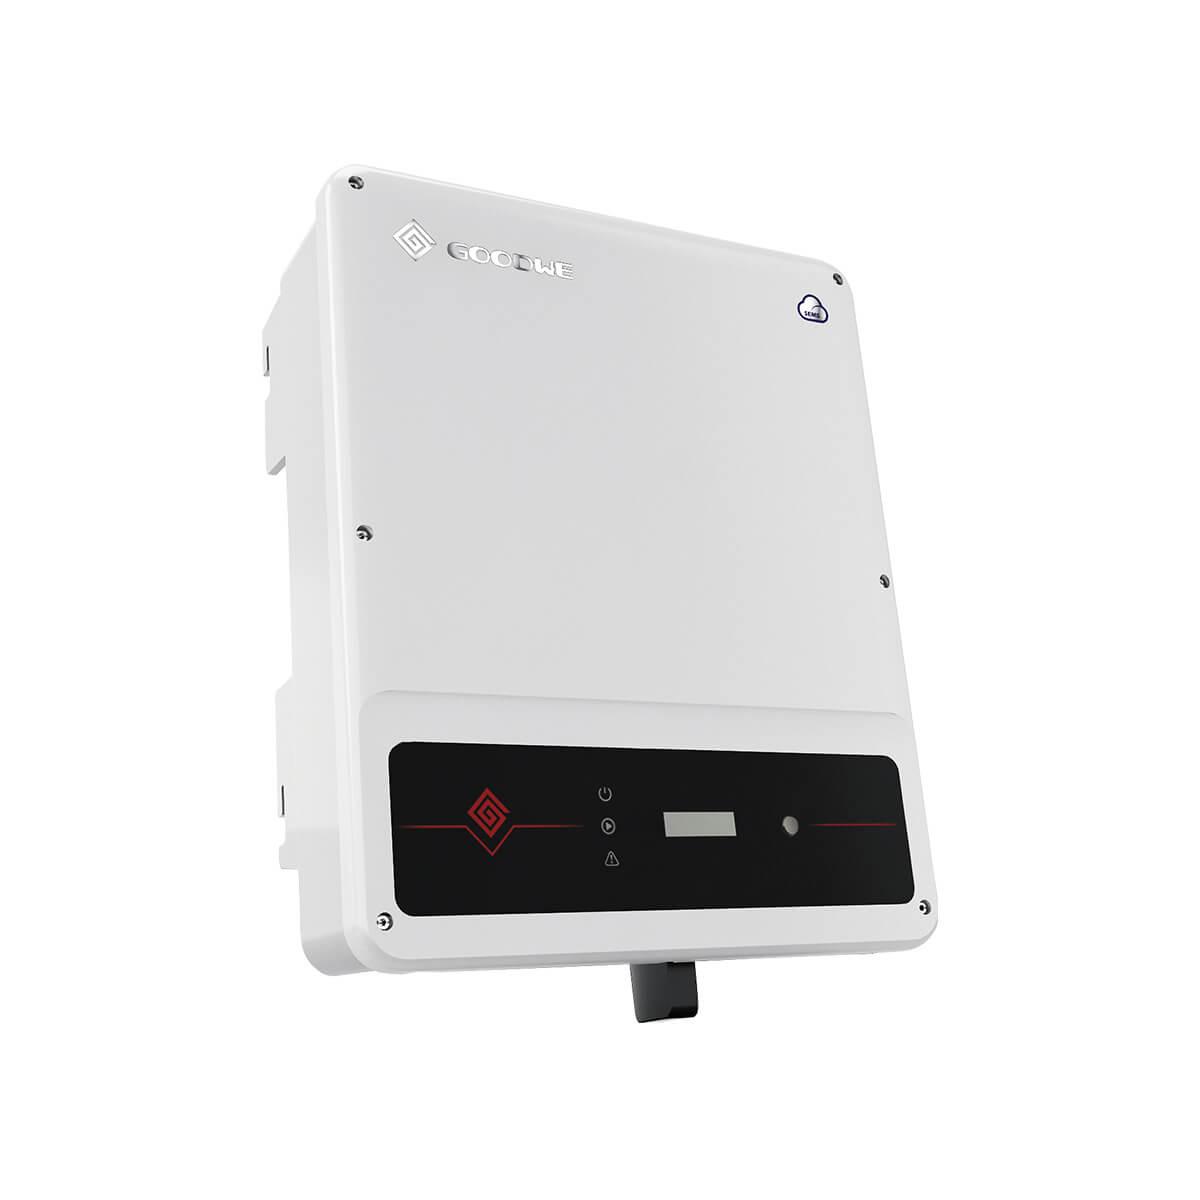 goodwe 10kW inverter, goodwe gw10kt-dt 10kW inverter, goodwe gw10kt-dt inverter, goodwe gw10kt-dt, goodwe 10 kW